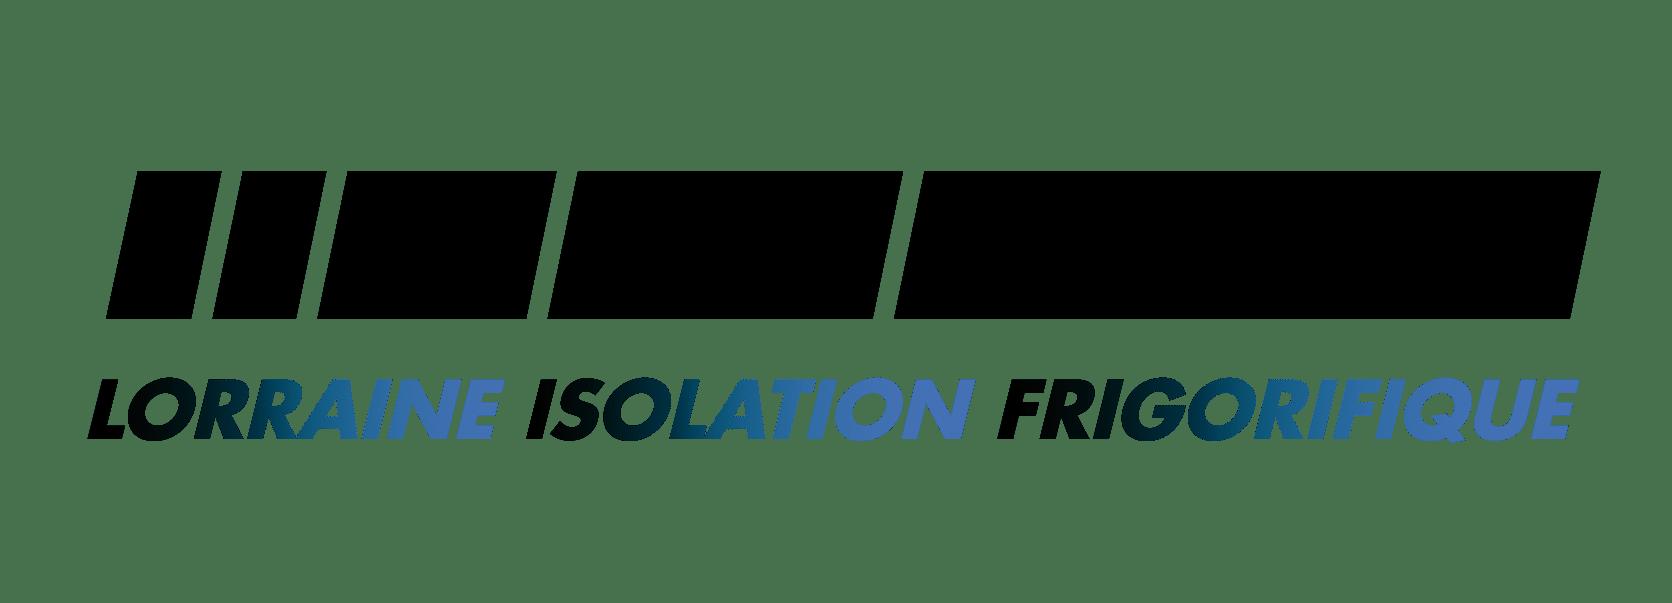 Lorraine Isolation Frigorifique